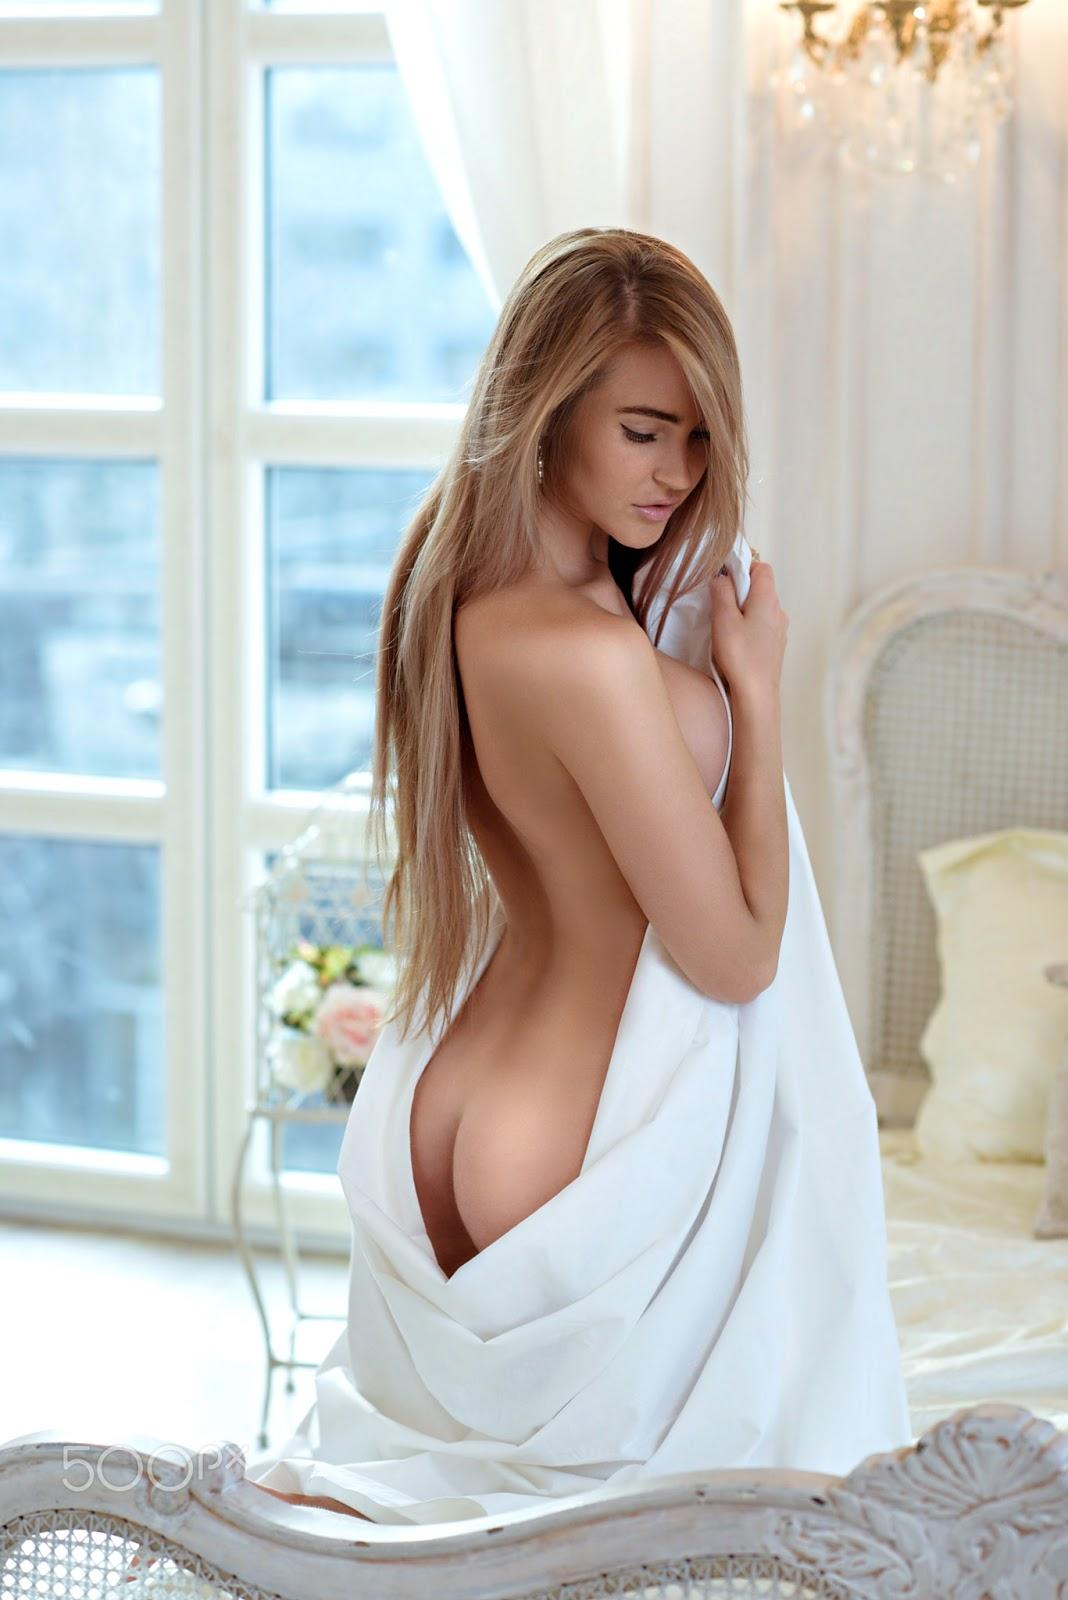 Sexy Lady Nude Photo